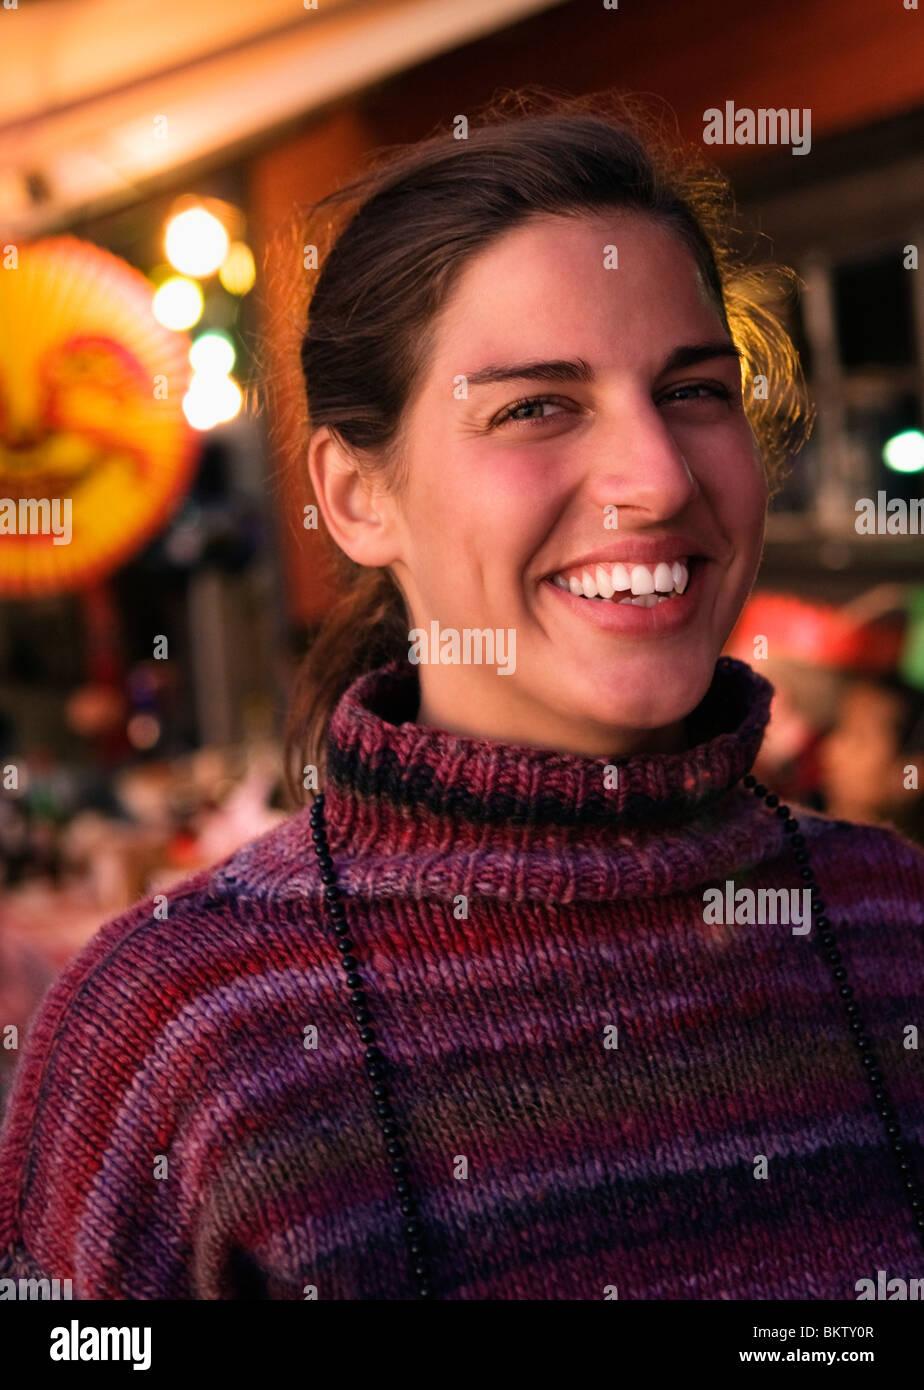 Woman at crayfish party - Stock Image